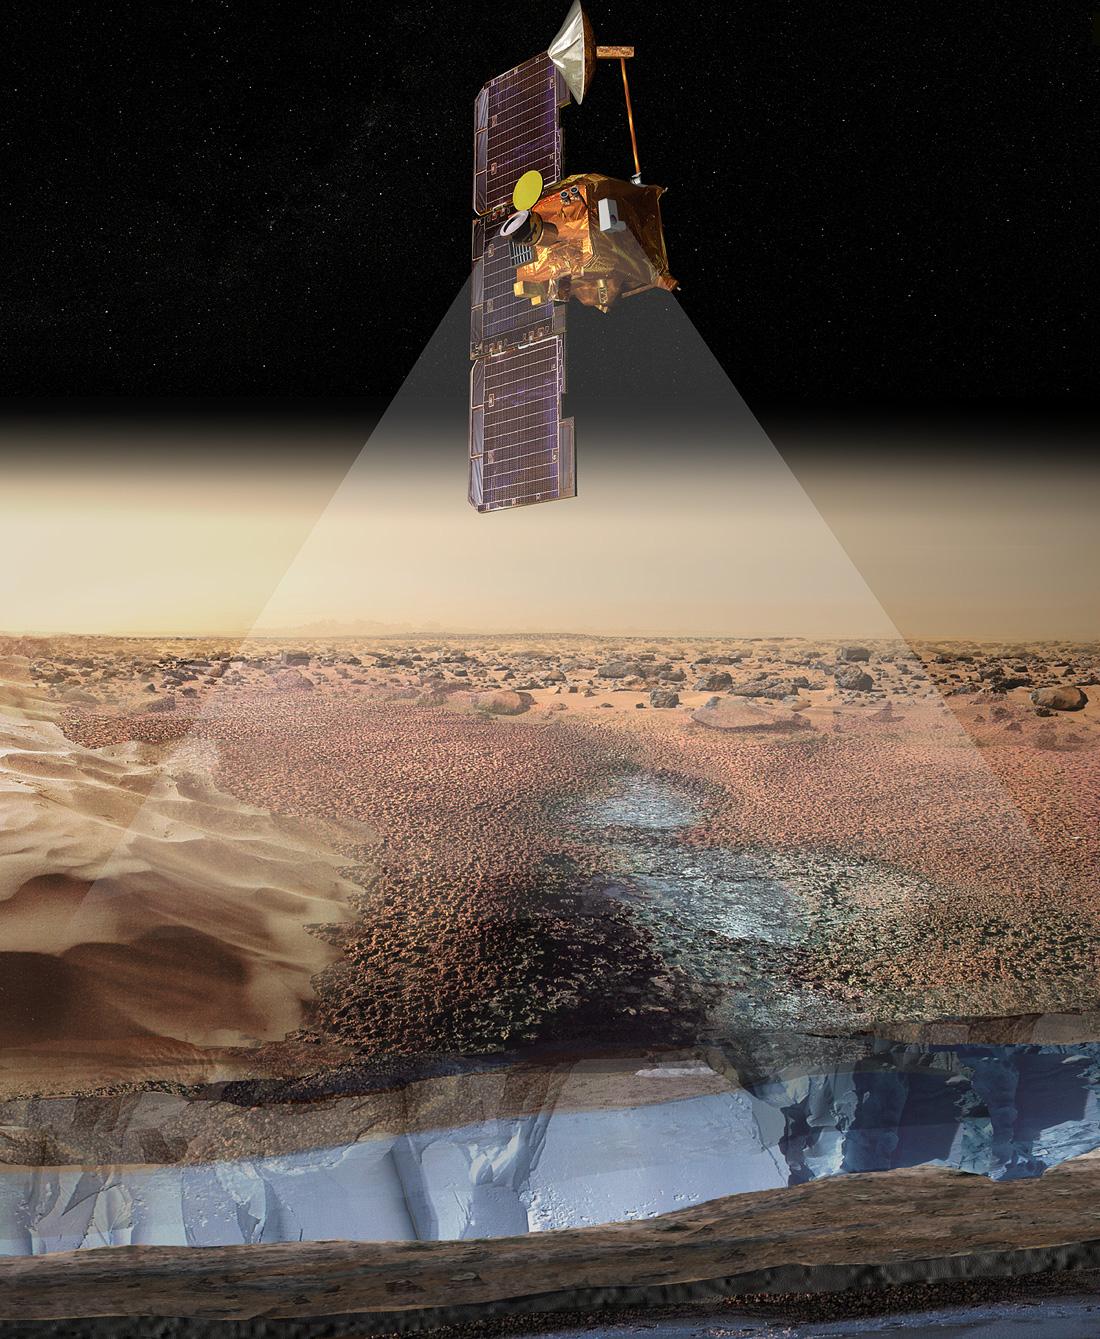 mars odyssey rover - photo #23